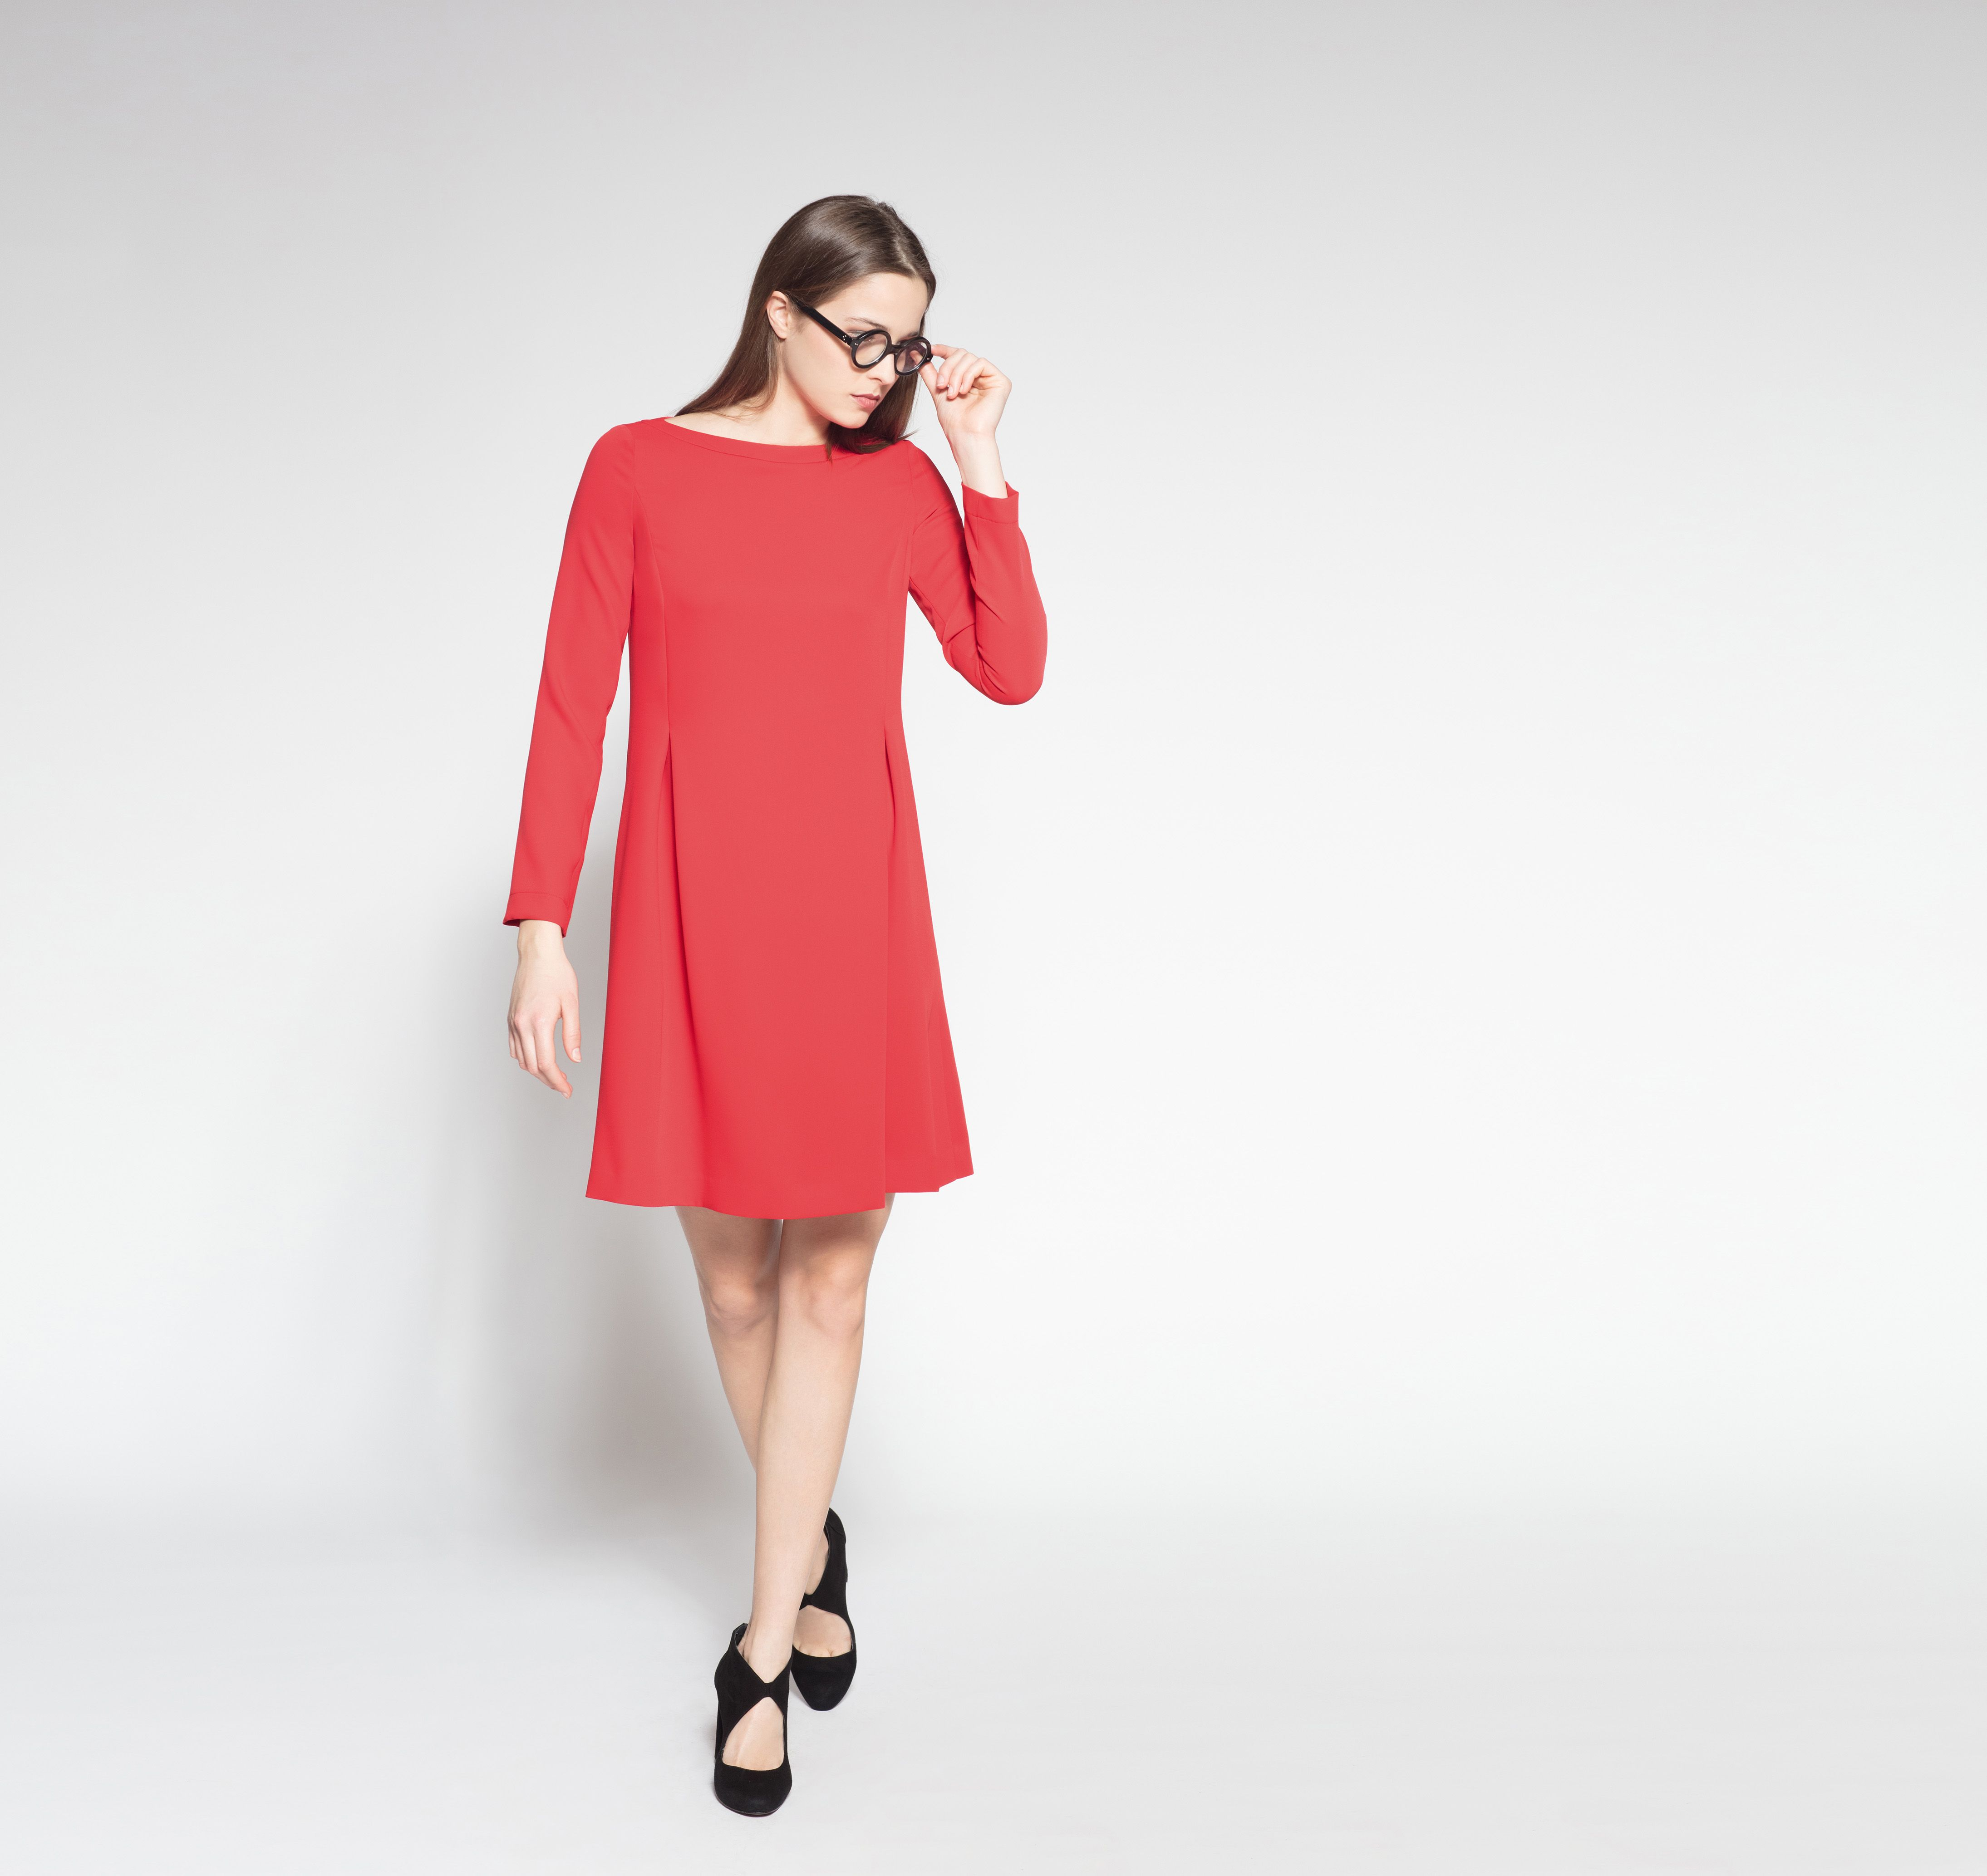 PIU & PIU Winter 15 Kleid Rot Langarm  Kleider mode, Kleider